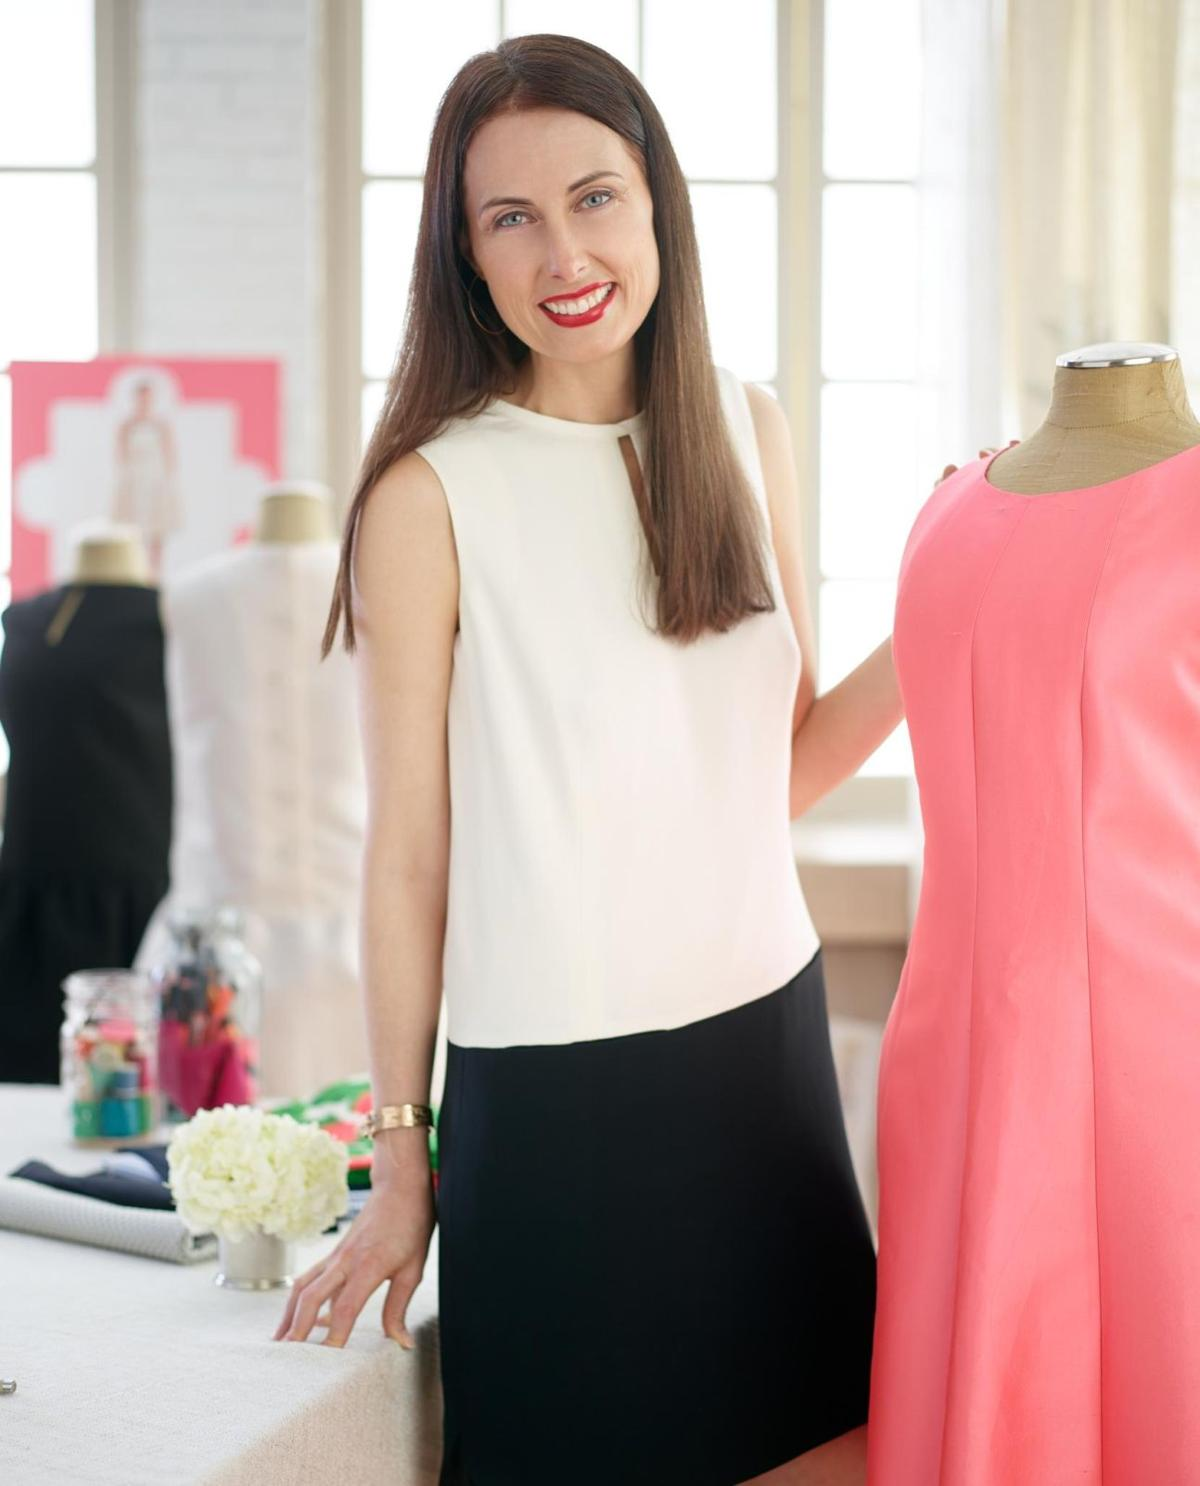 Fresh palette marks designer's spring fashions